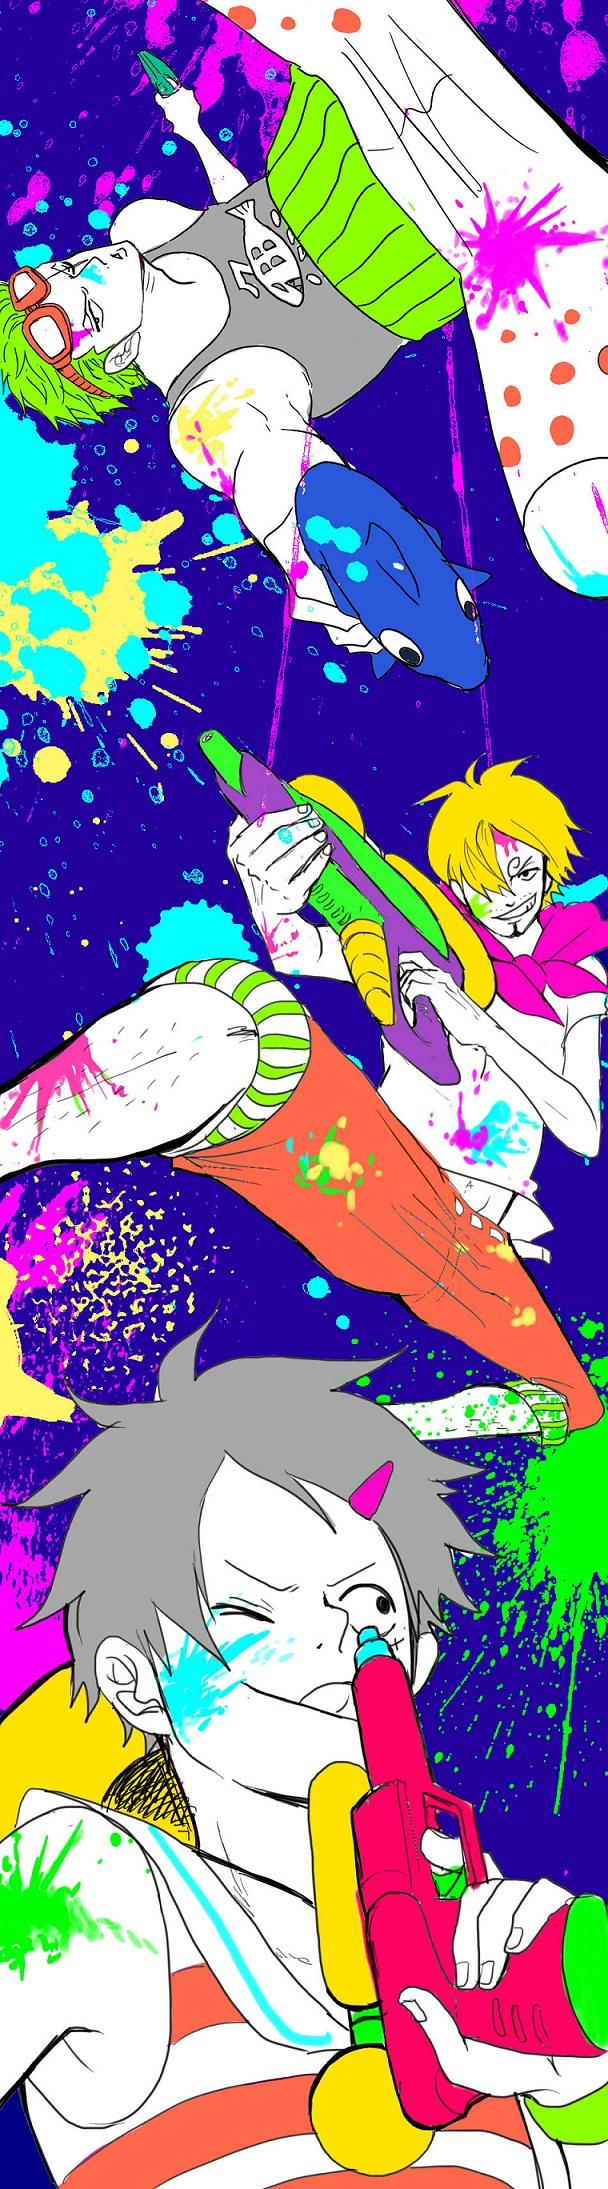 Tags: Anime, Daishou (Hiroto), ONE PIECE, Sanji, Monkey D. Luffy, Roronoa Zoro, Pixiv, One Piece: Two Years Later, Straw Hat Pirates, Monster Trio